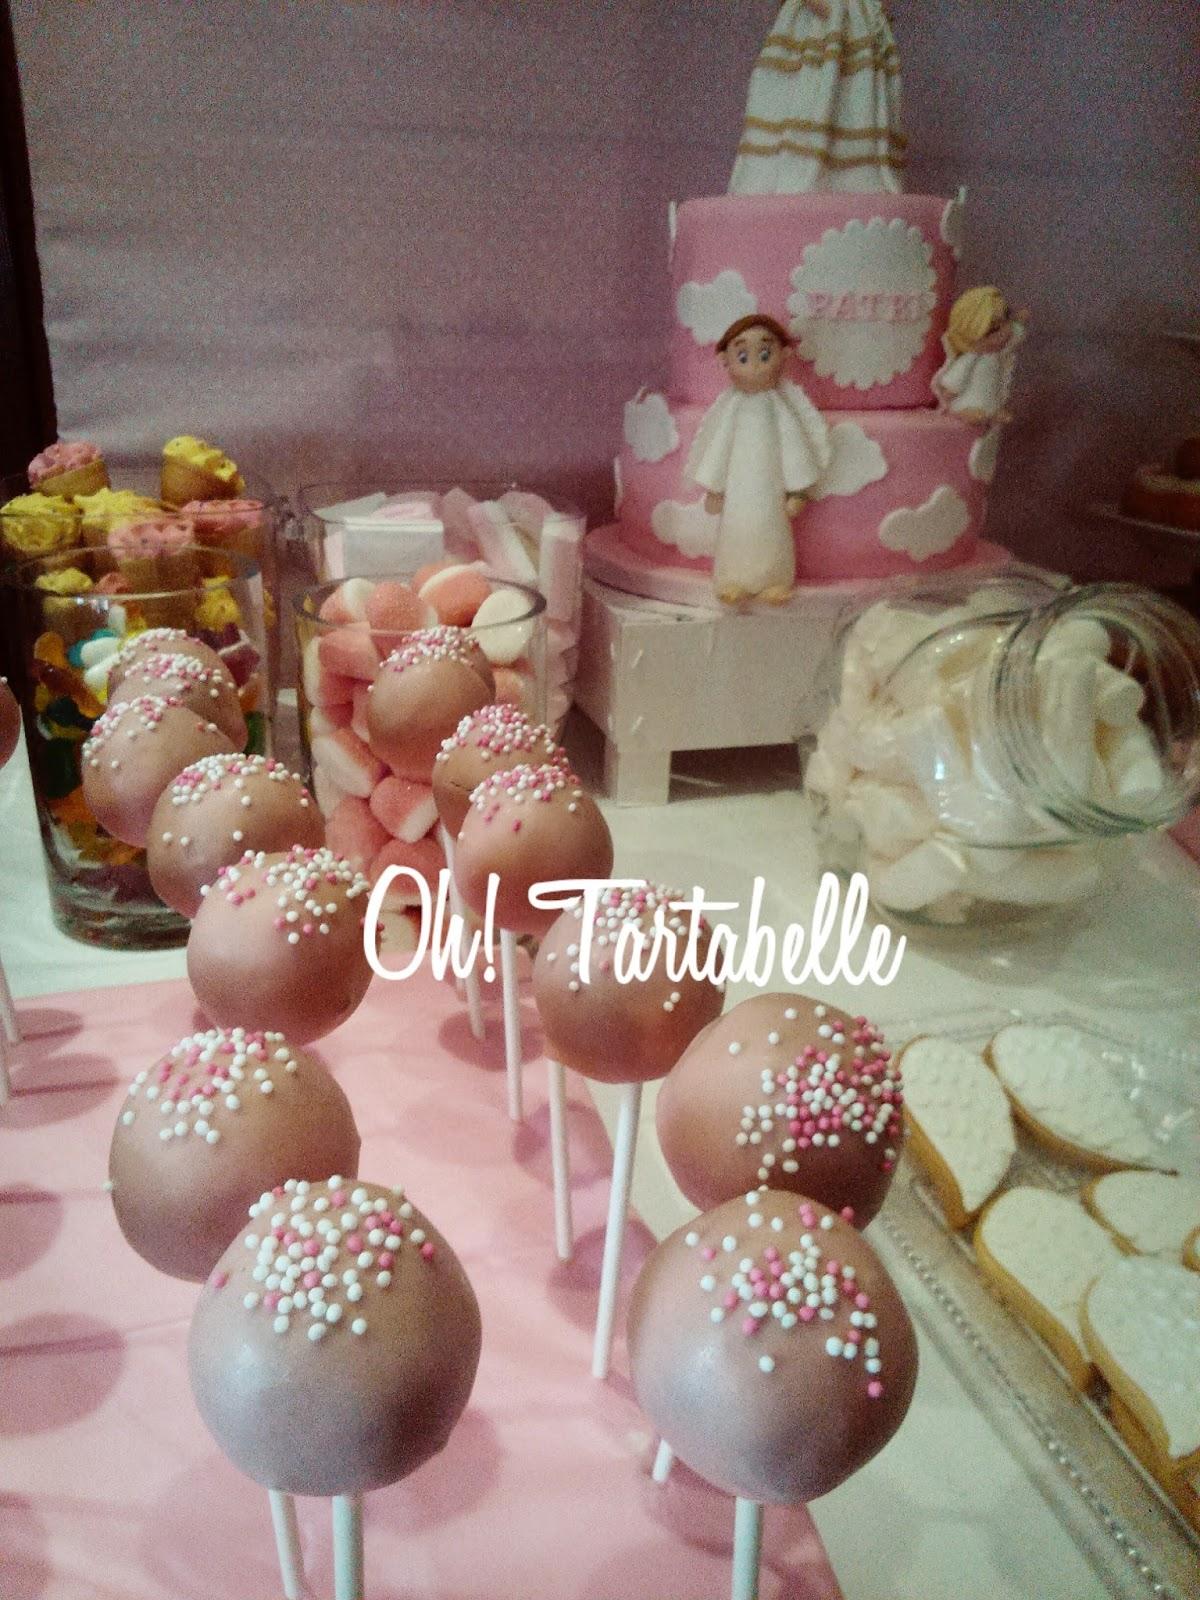 Oh tartabelle mesas dulces y tartas para comuniones - Preparar mesa dulce para comunion ...